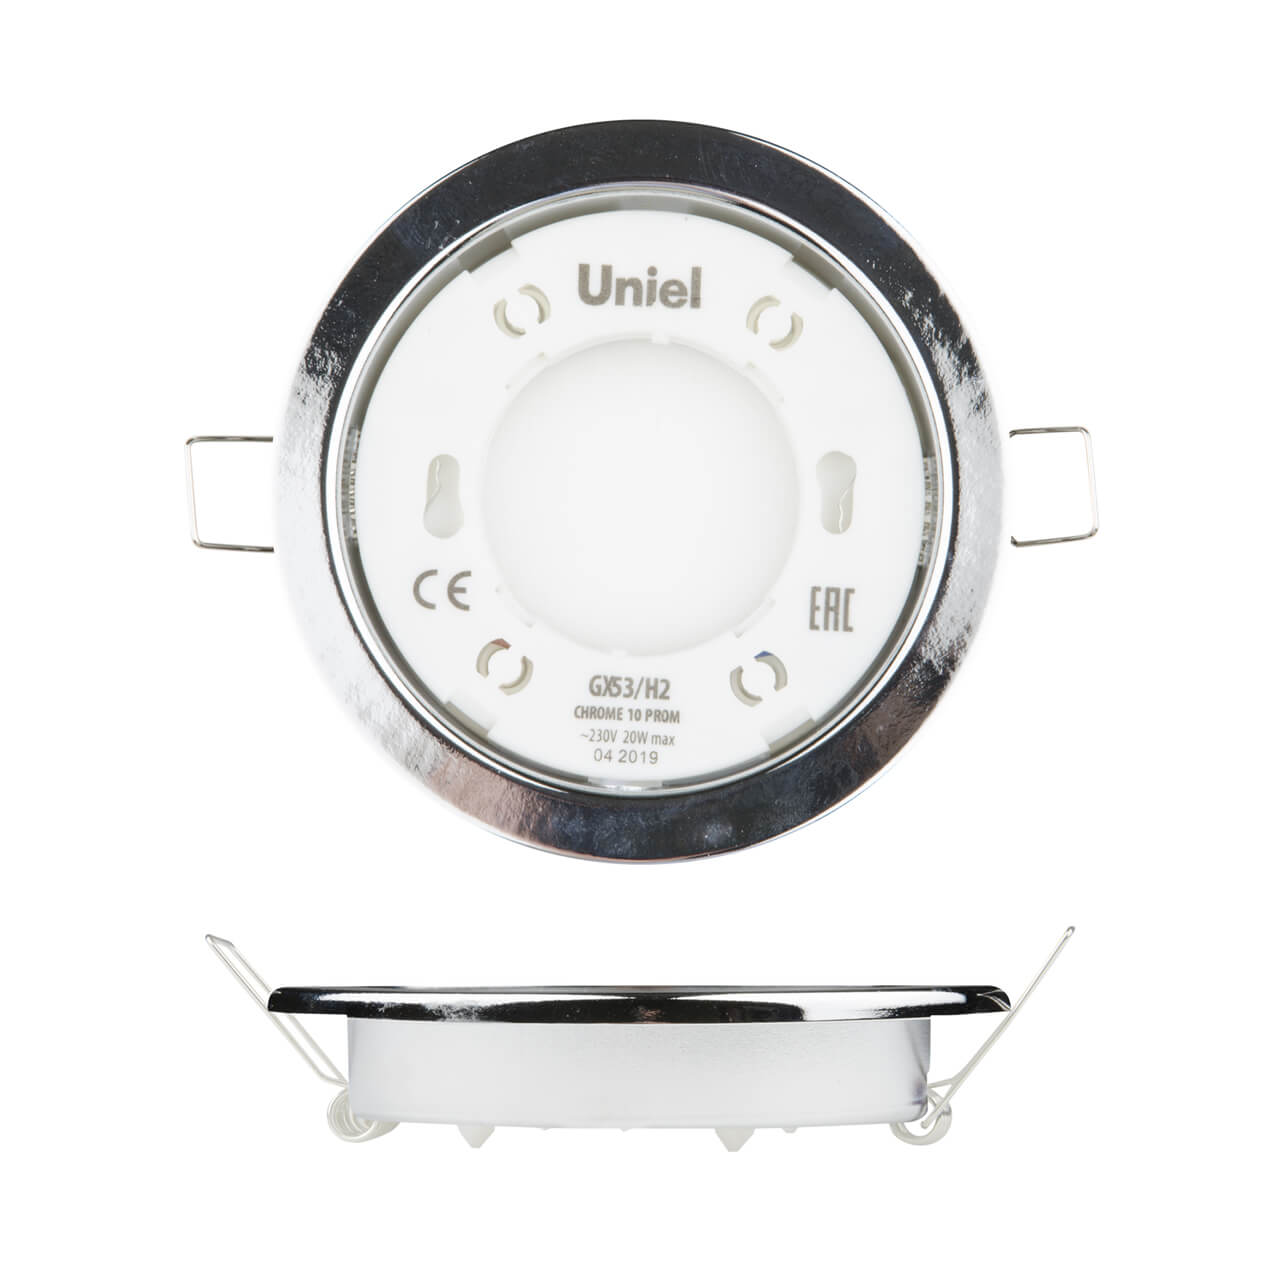 Встраиваемый светильник (UL-00005052) Uniel GX53/H2 Chrome 10 Prom цены